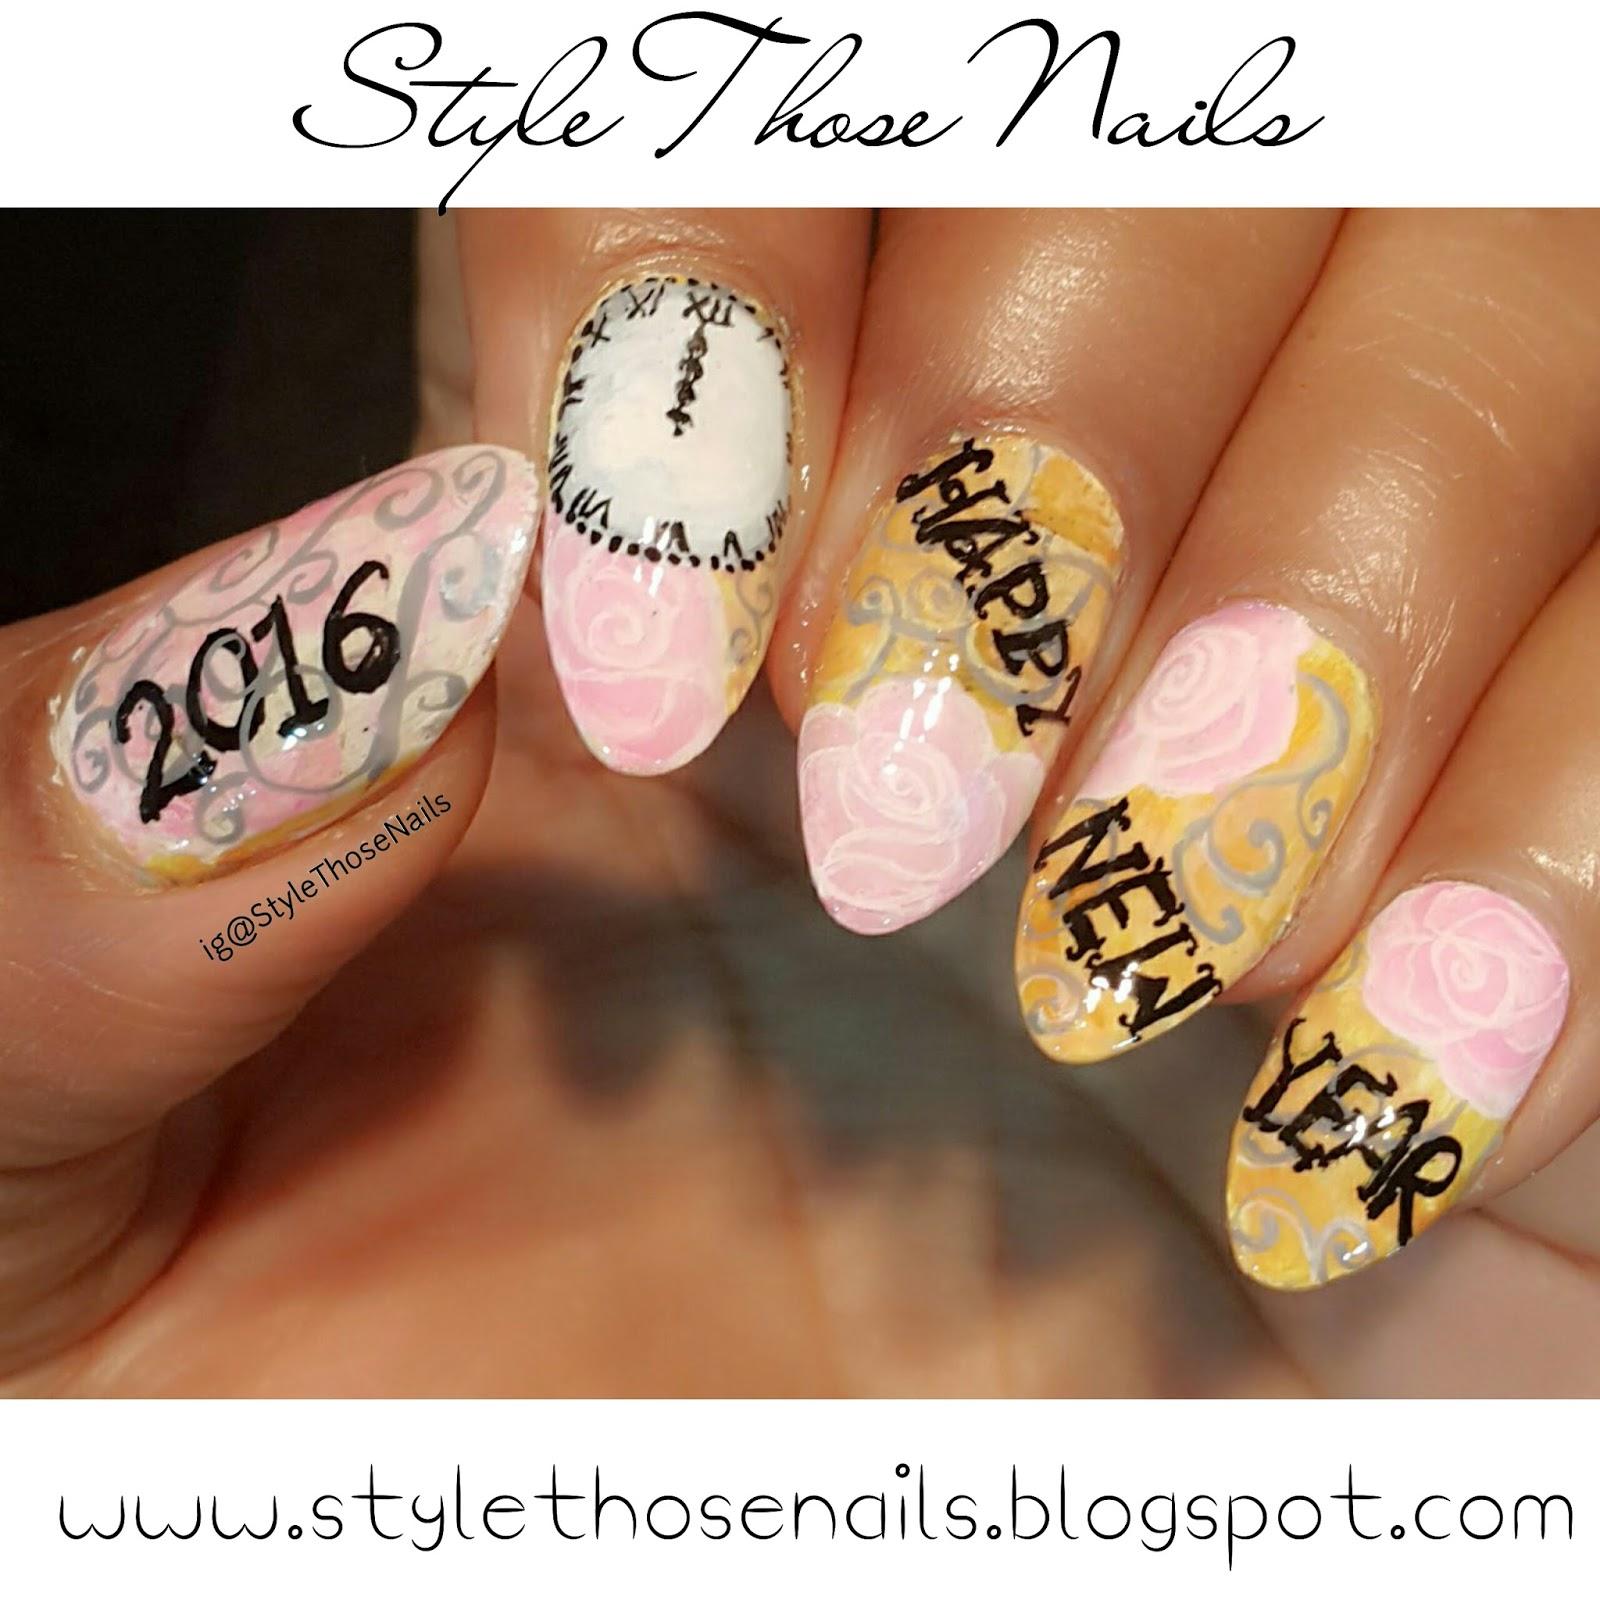 Style Those Nails: 40 Great Nailart Ideas- New Year Nails 2016